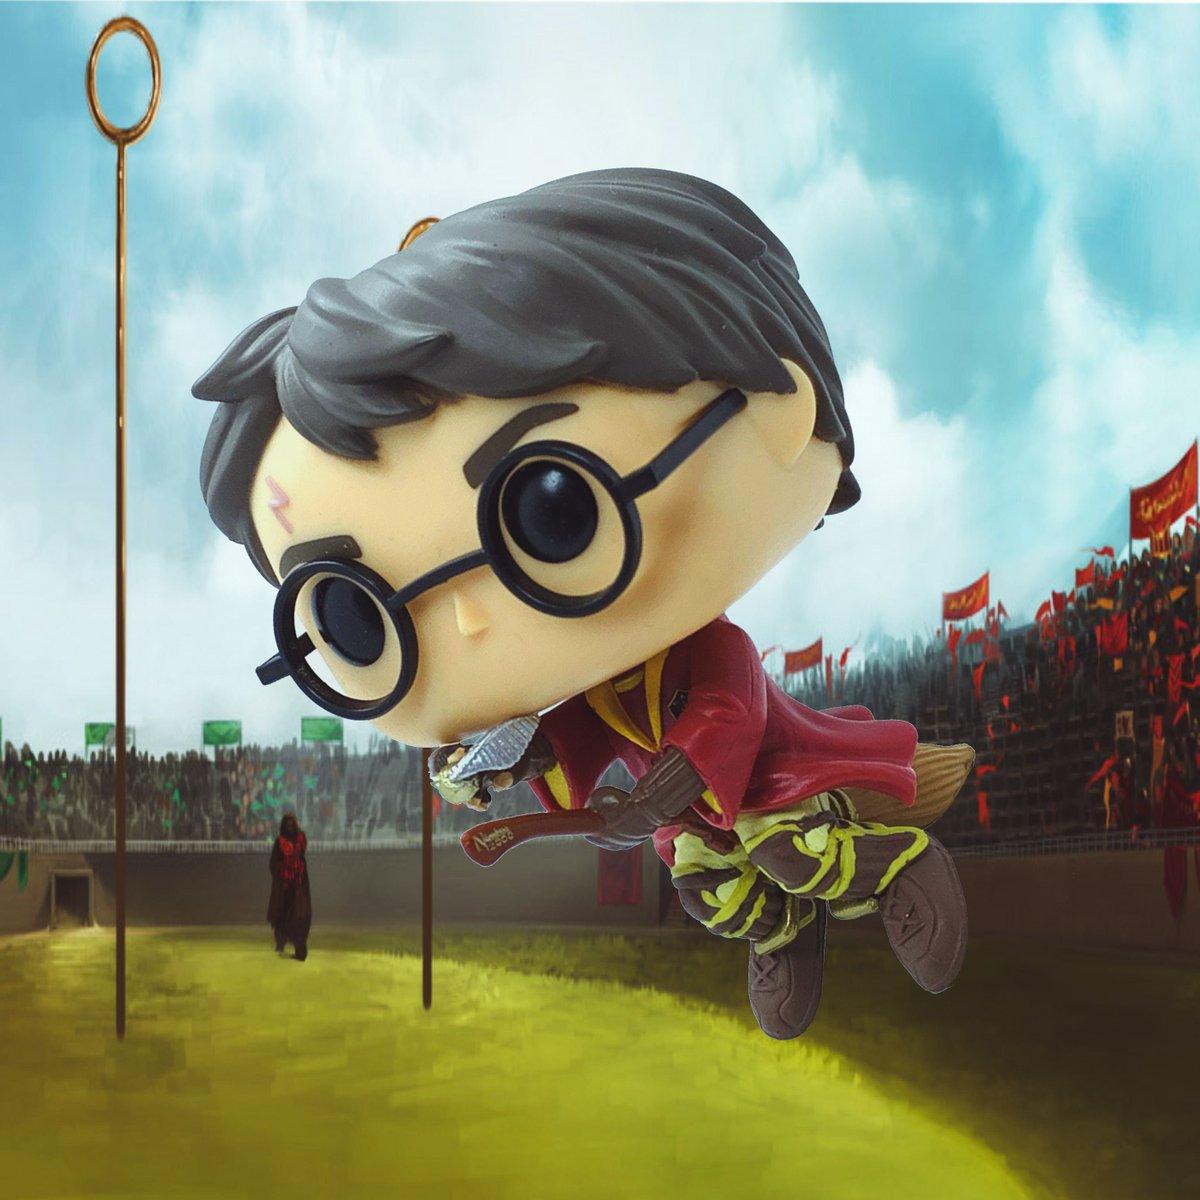 Quidditch  #funko #funkopop #funkopops #funkopopvinyl #funkophotoaday #funkomania #funkophotography #funkofamily #funkoaddict #funkoaddiction #funkocollection #funkocollector #funkofanatic #pop #popvinyl #popfigures  #toys #harrypotter #sdcc2017 #sdccexclusive #quidditch #snitch